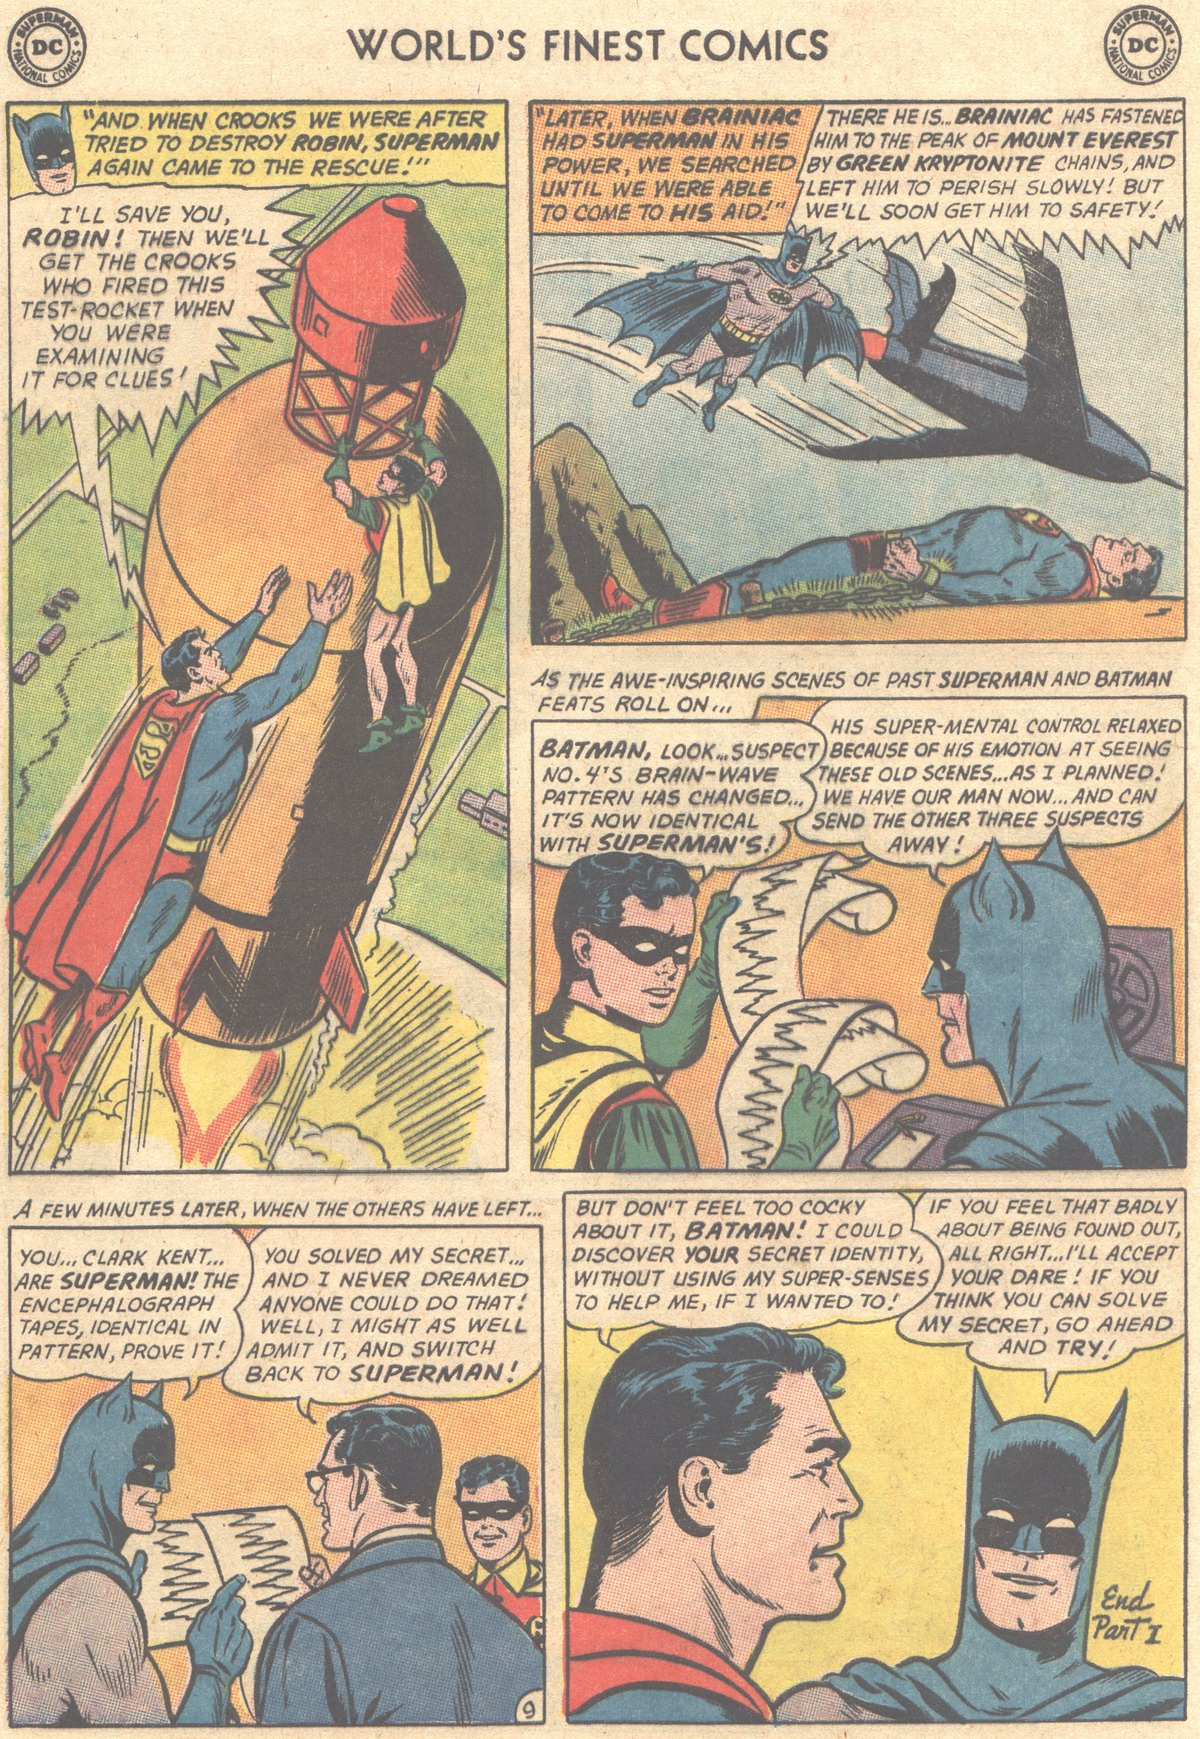 Read online World's Finest Comics comic -  Issue #149 - 12